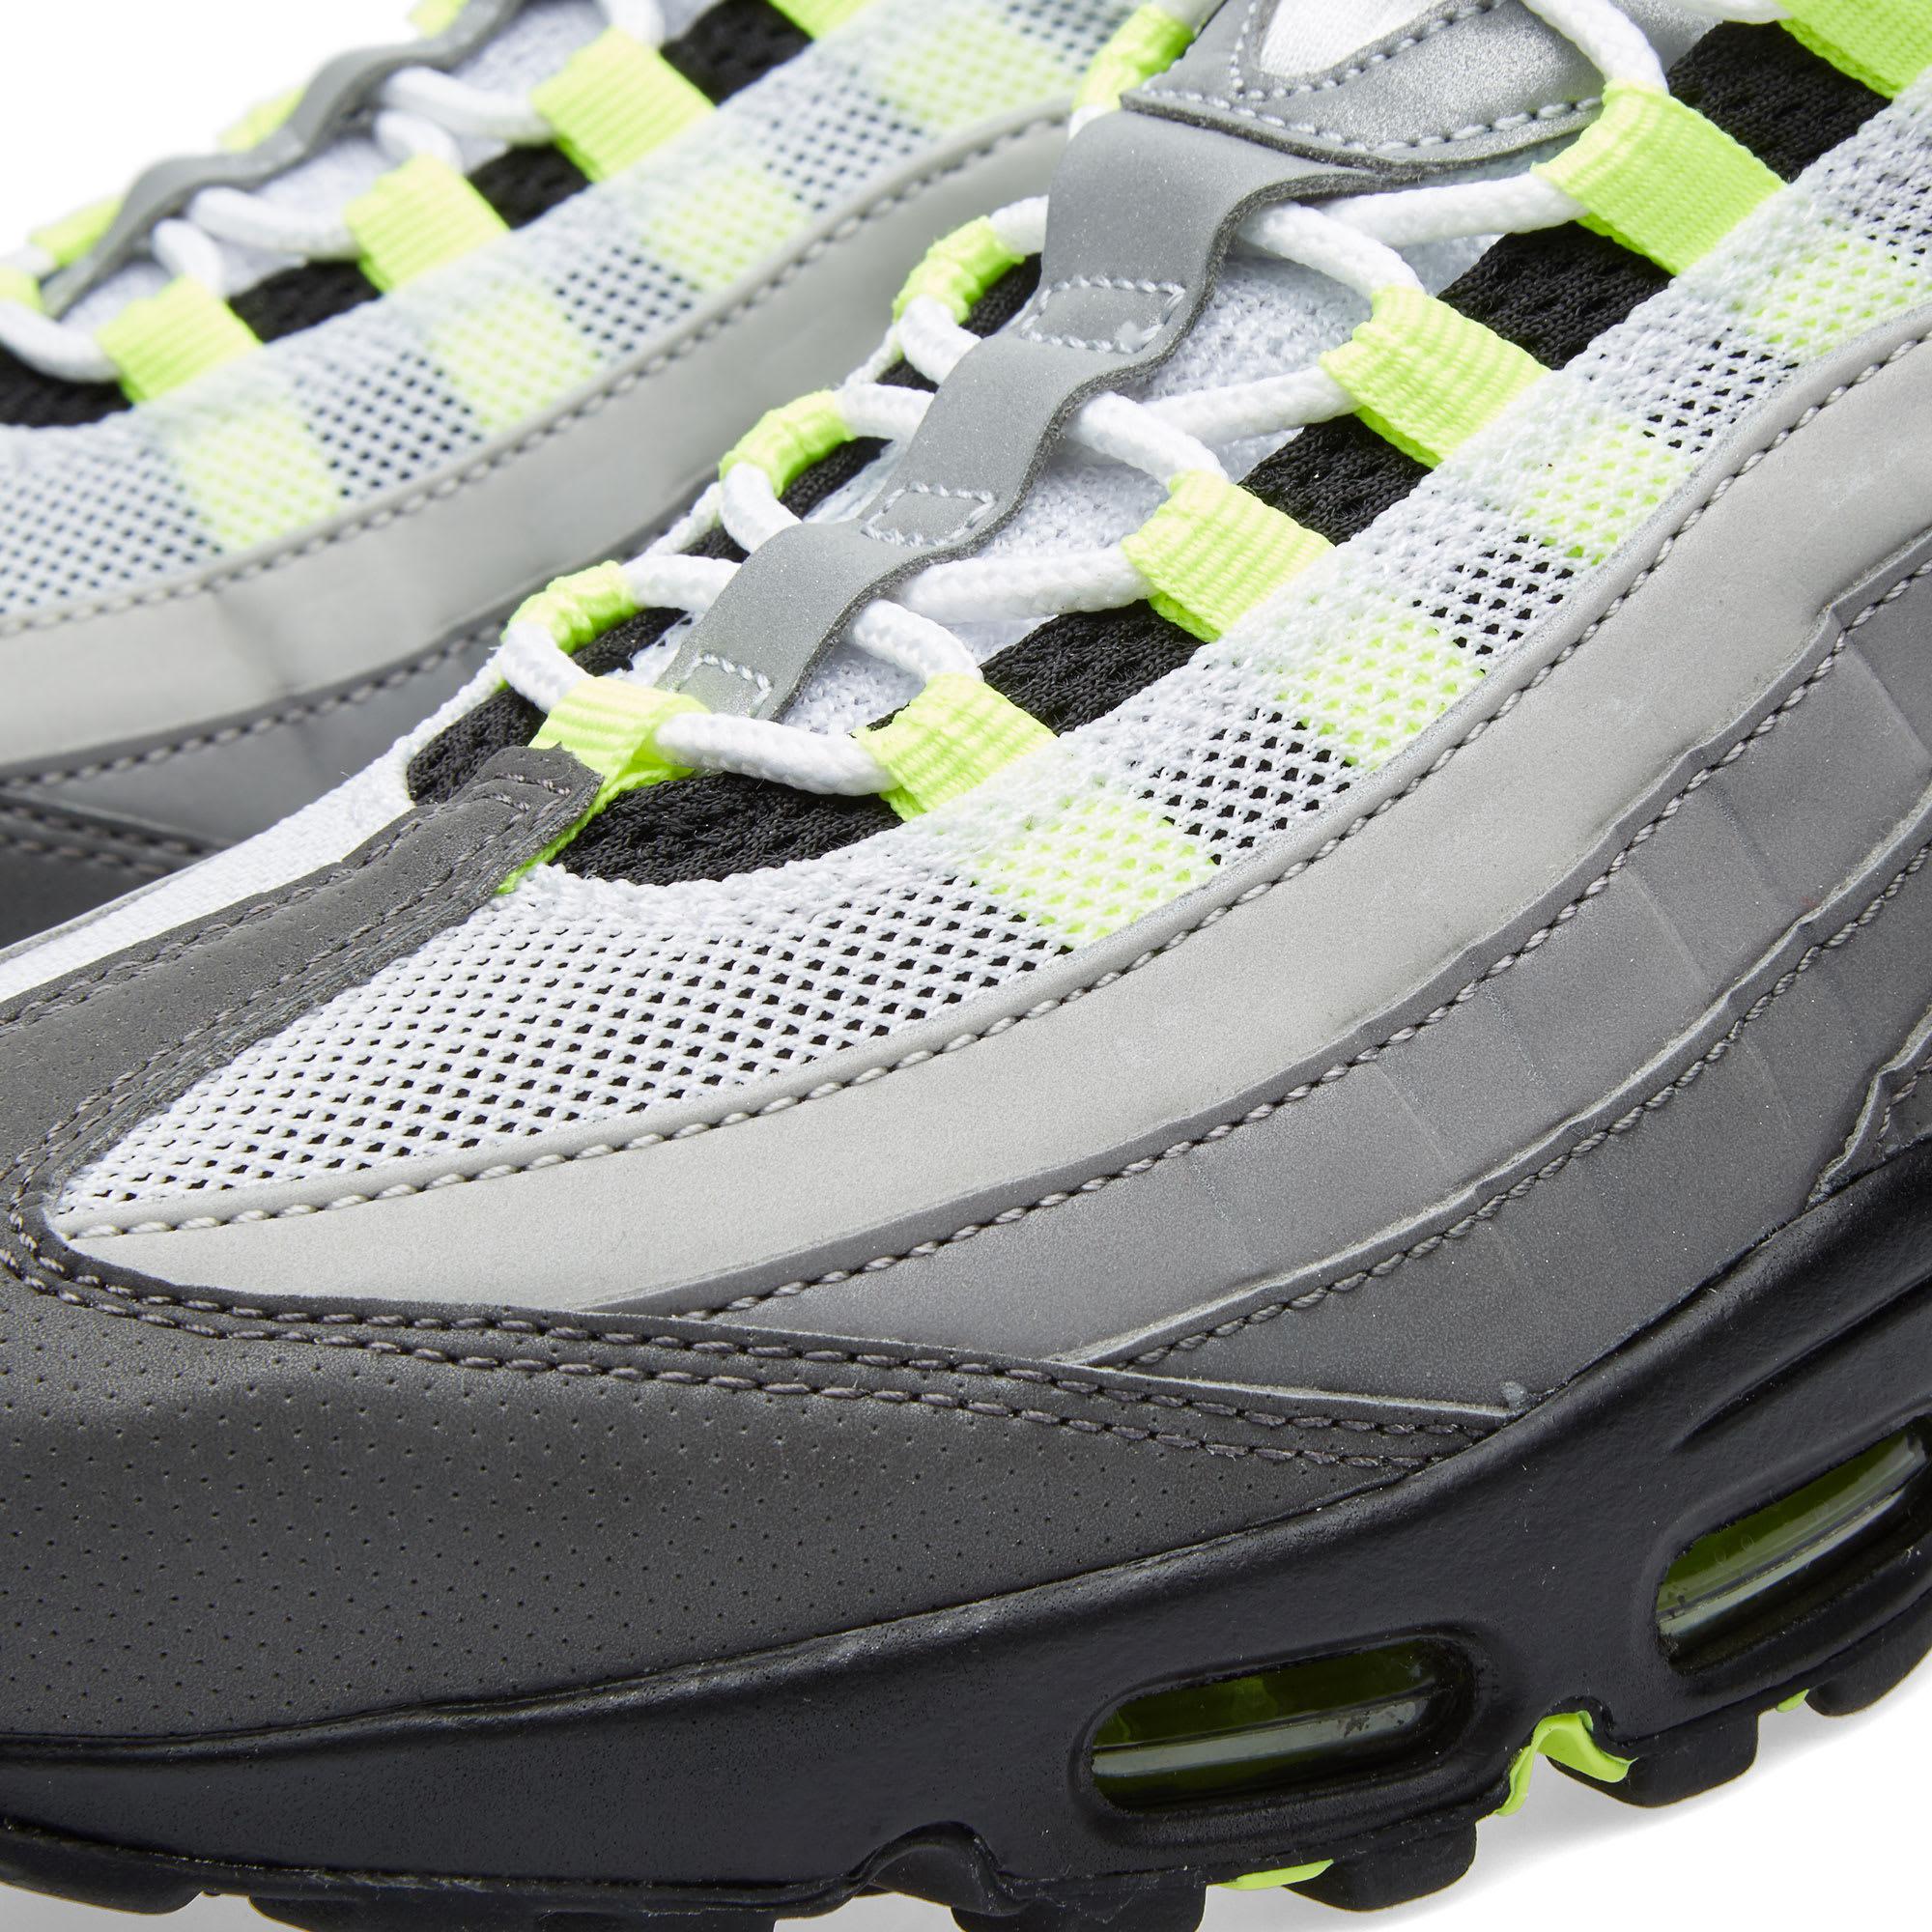 uk availability f589b 25b18 Nike Air Max 95 OG Premium Leather  Reflective  Black, Volt   Medium Ash    END.